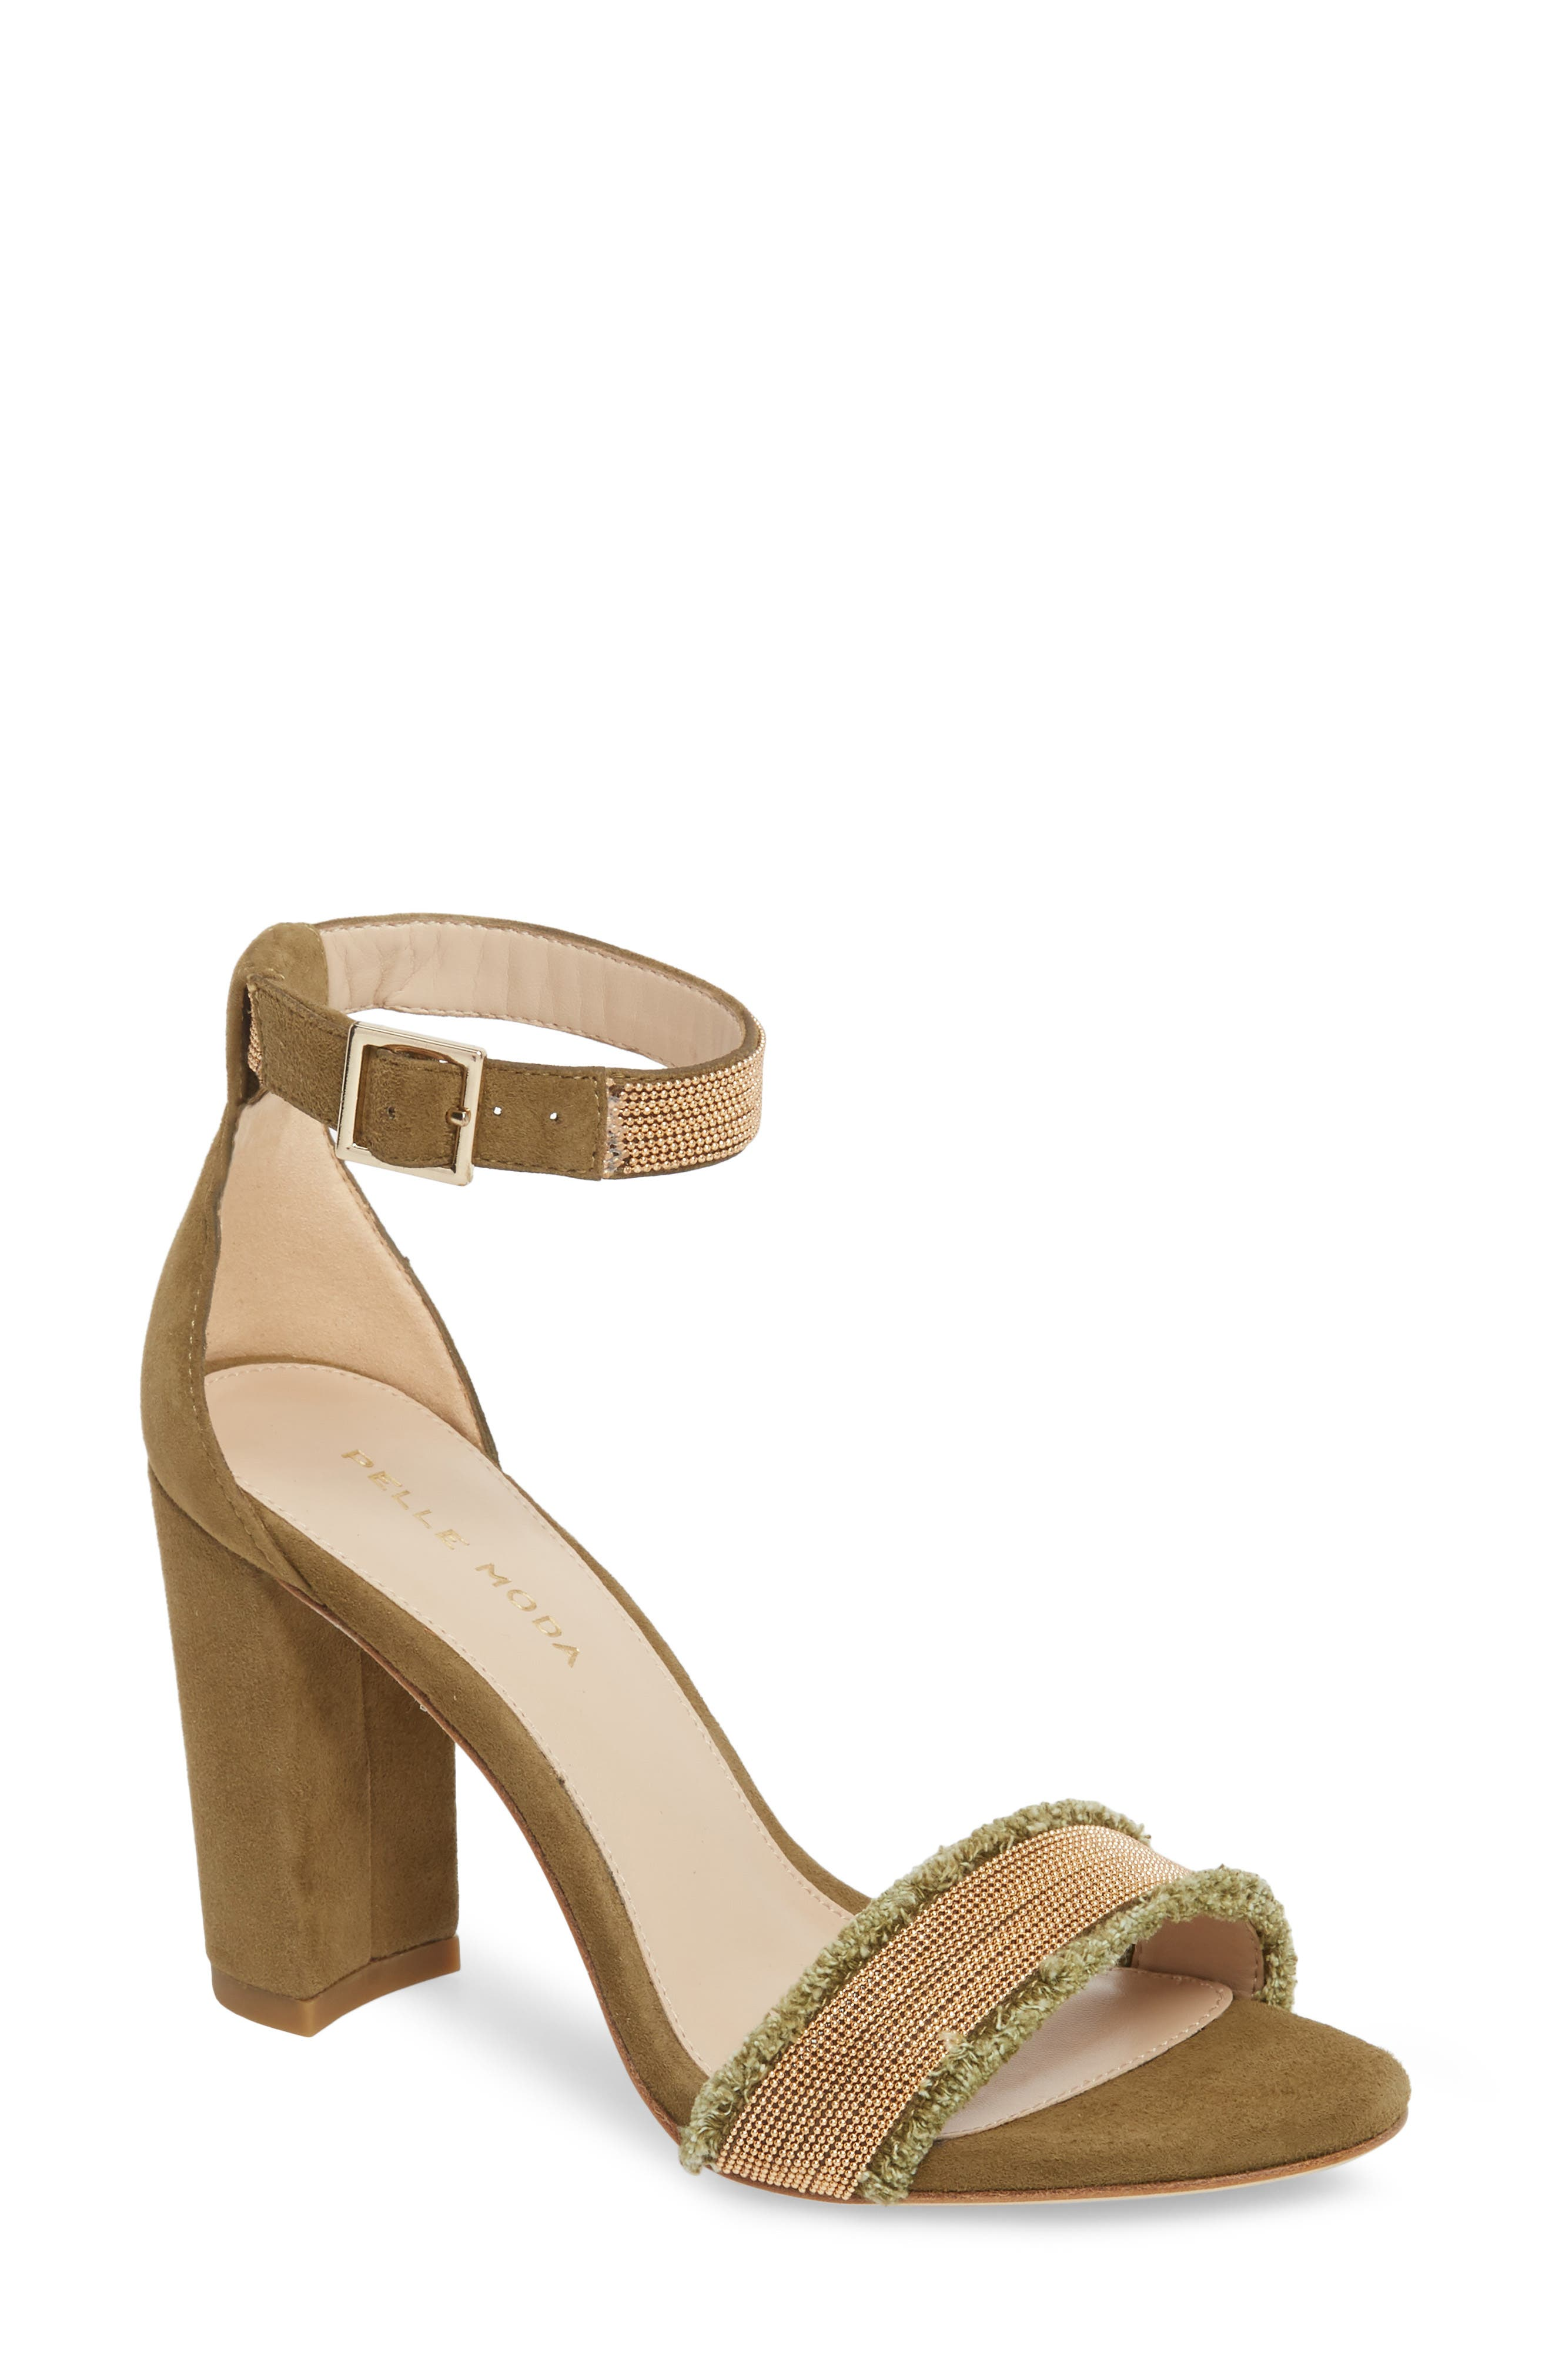 Bonnie6 Embellished Sandal,                         Main,                         color, KHAKI SUEDE